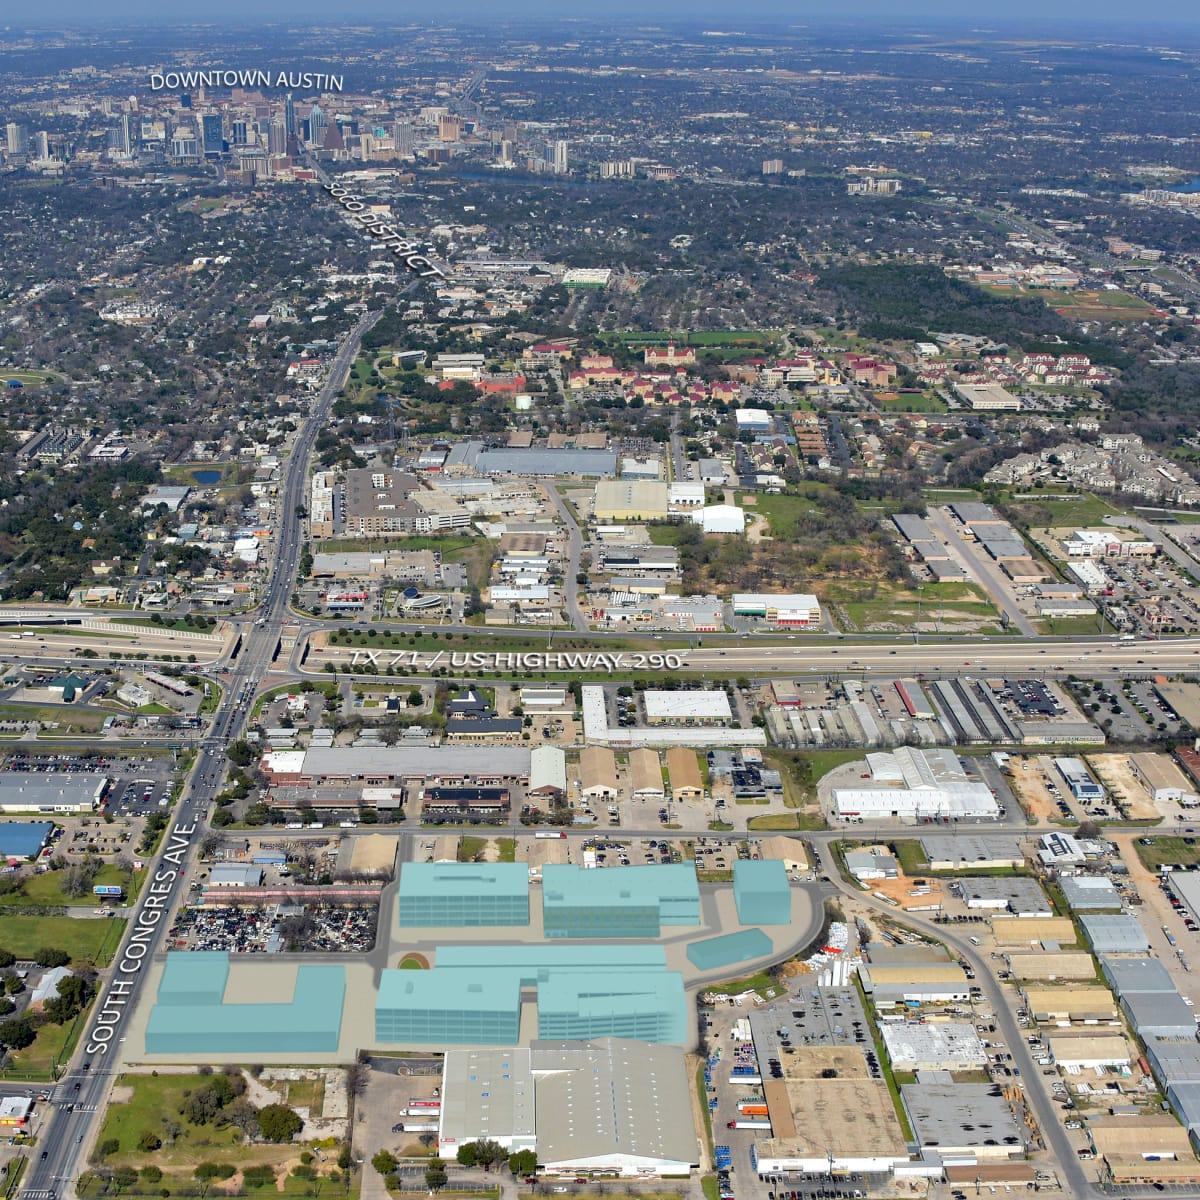 Saint Elmo Public Market rendering South Austin aerial map 2015